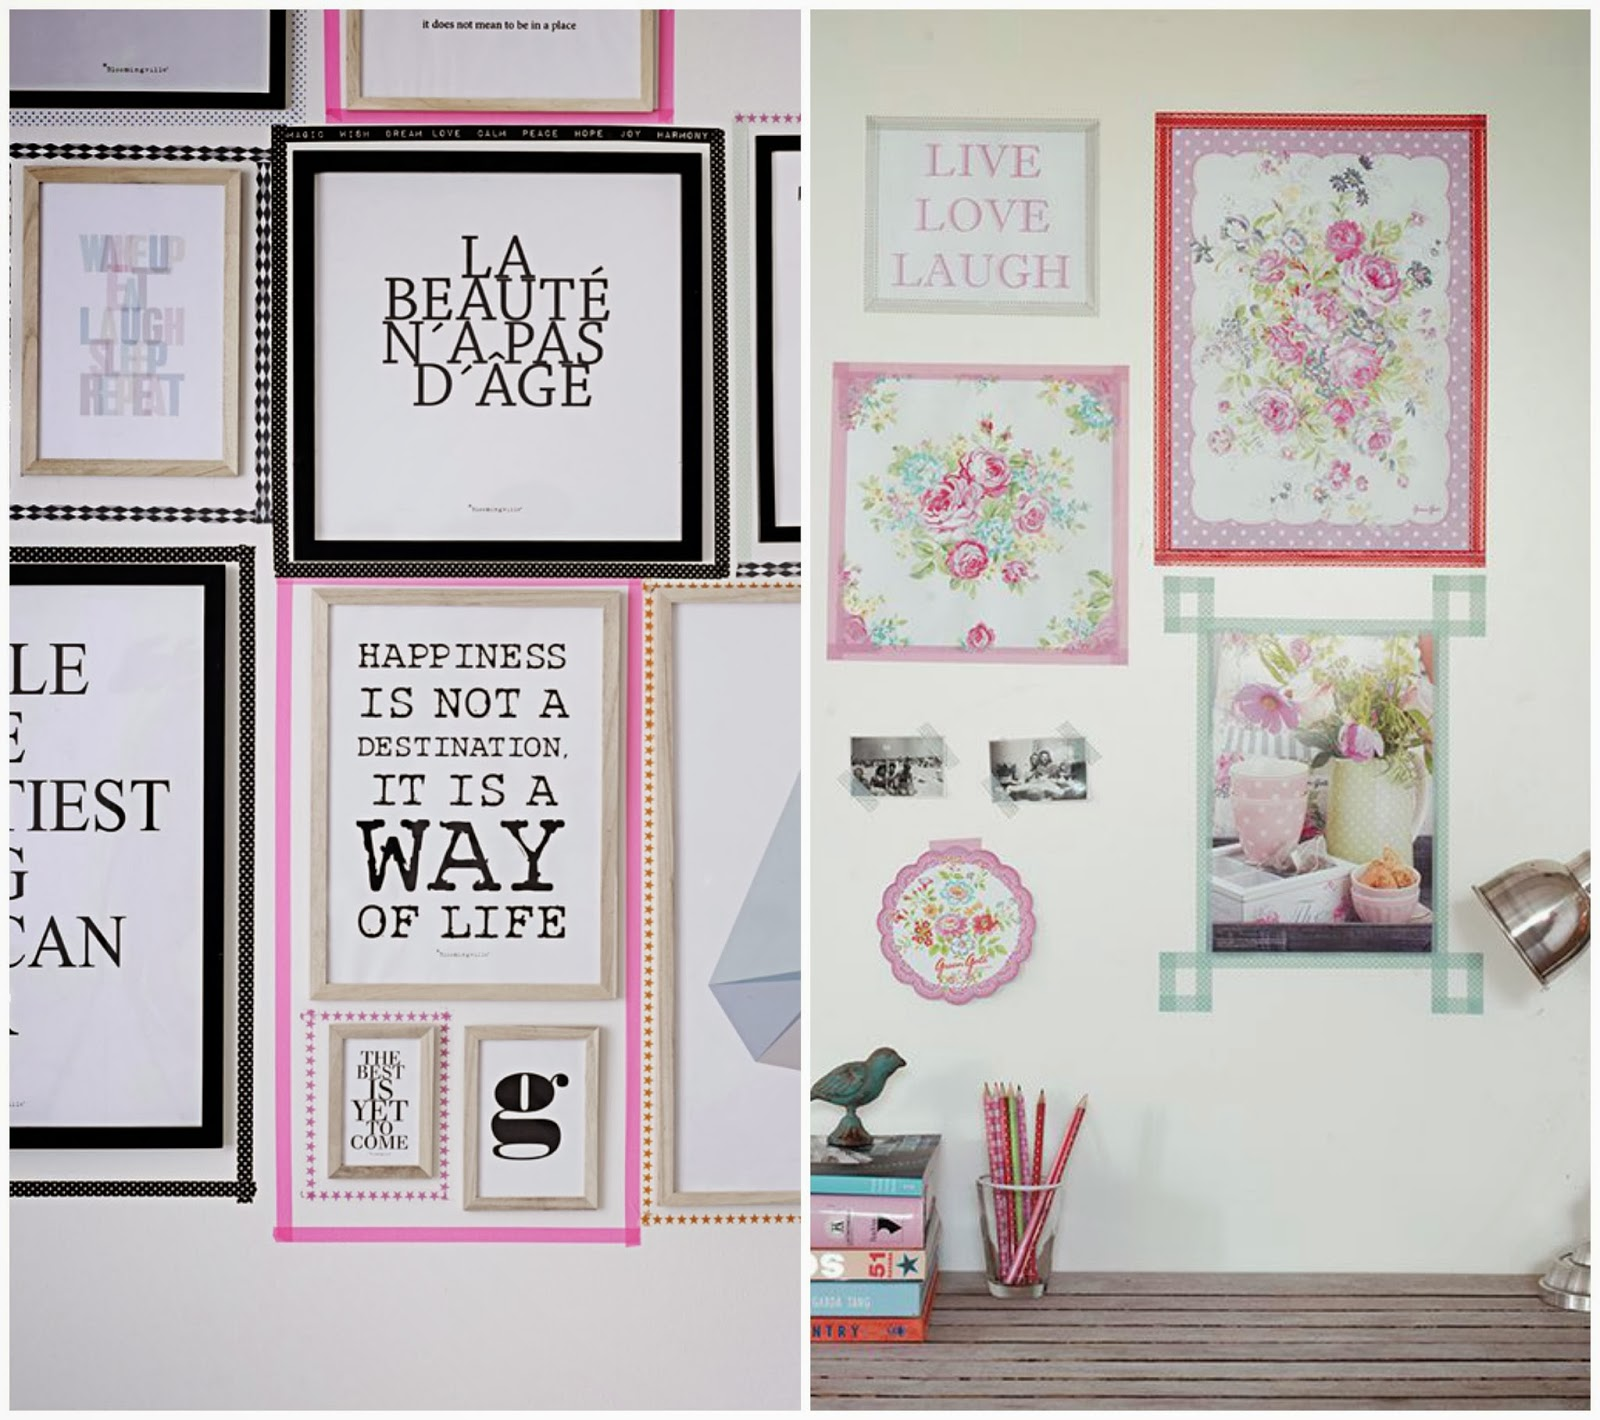 Ideas decoracion washi tape - Ideas para decorar con washi tape ...